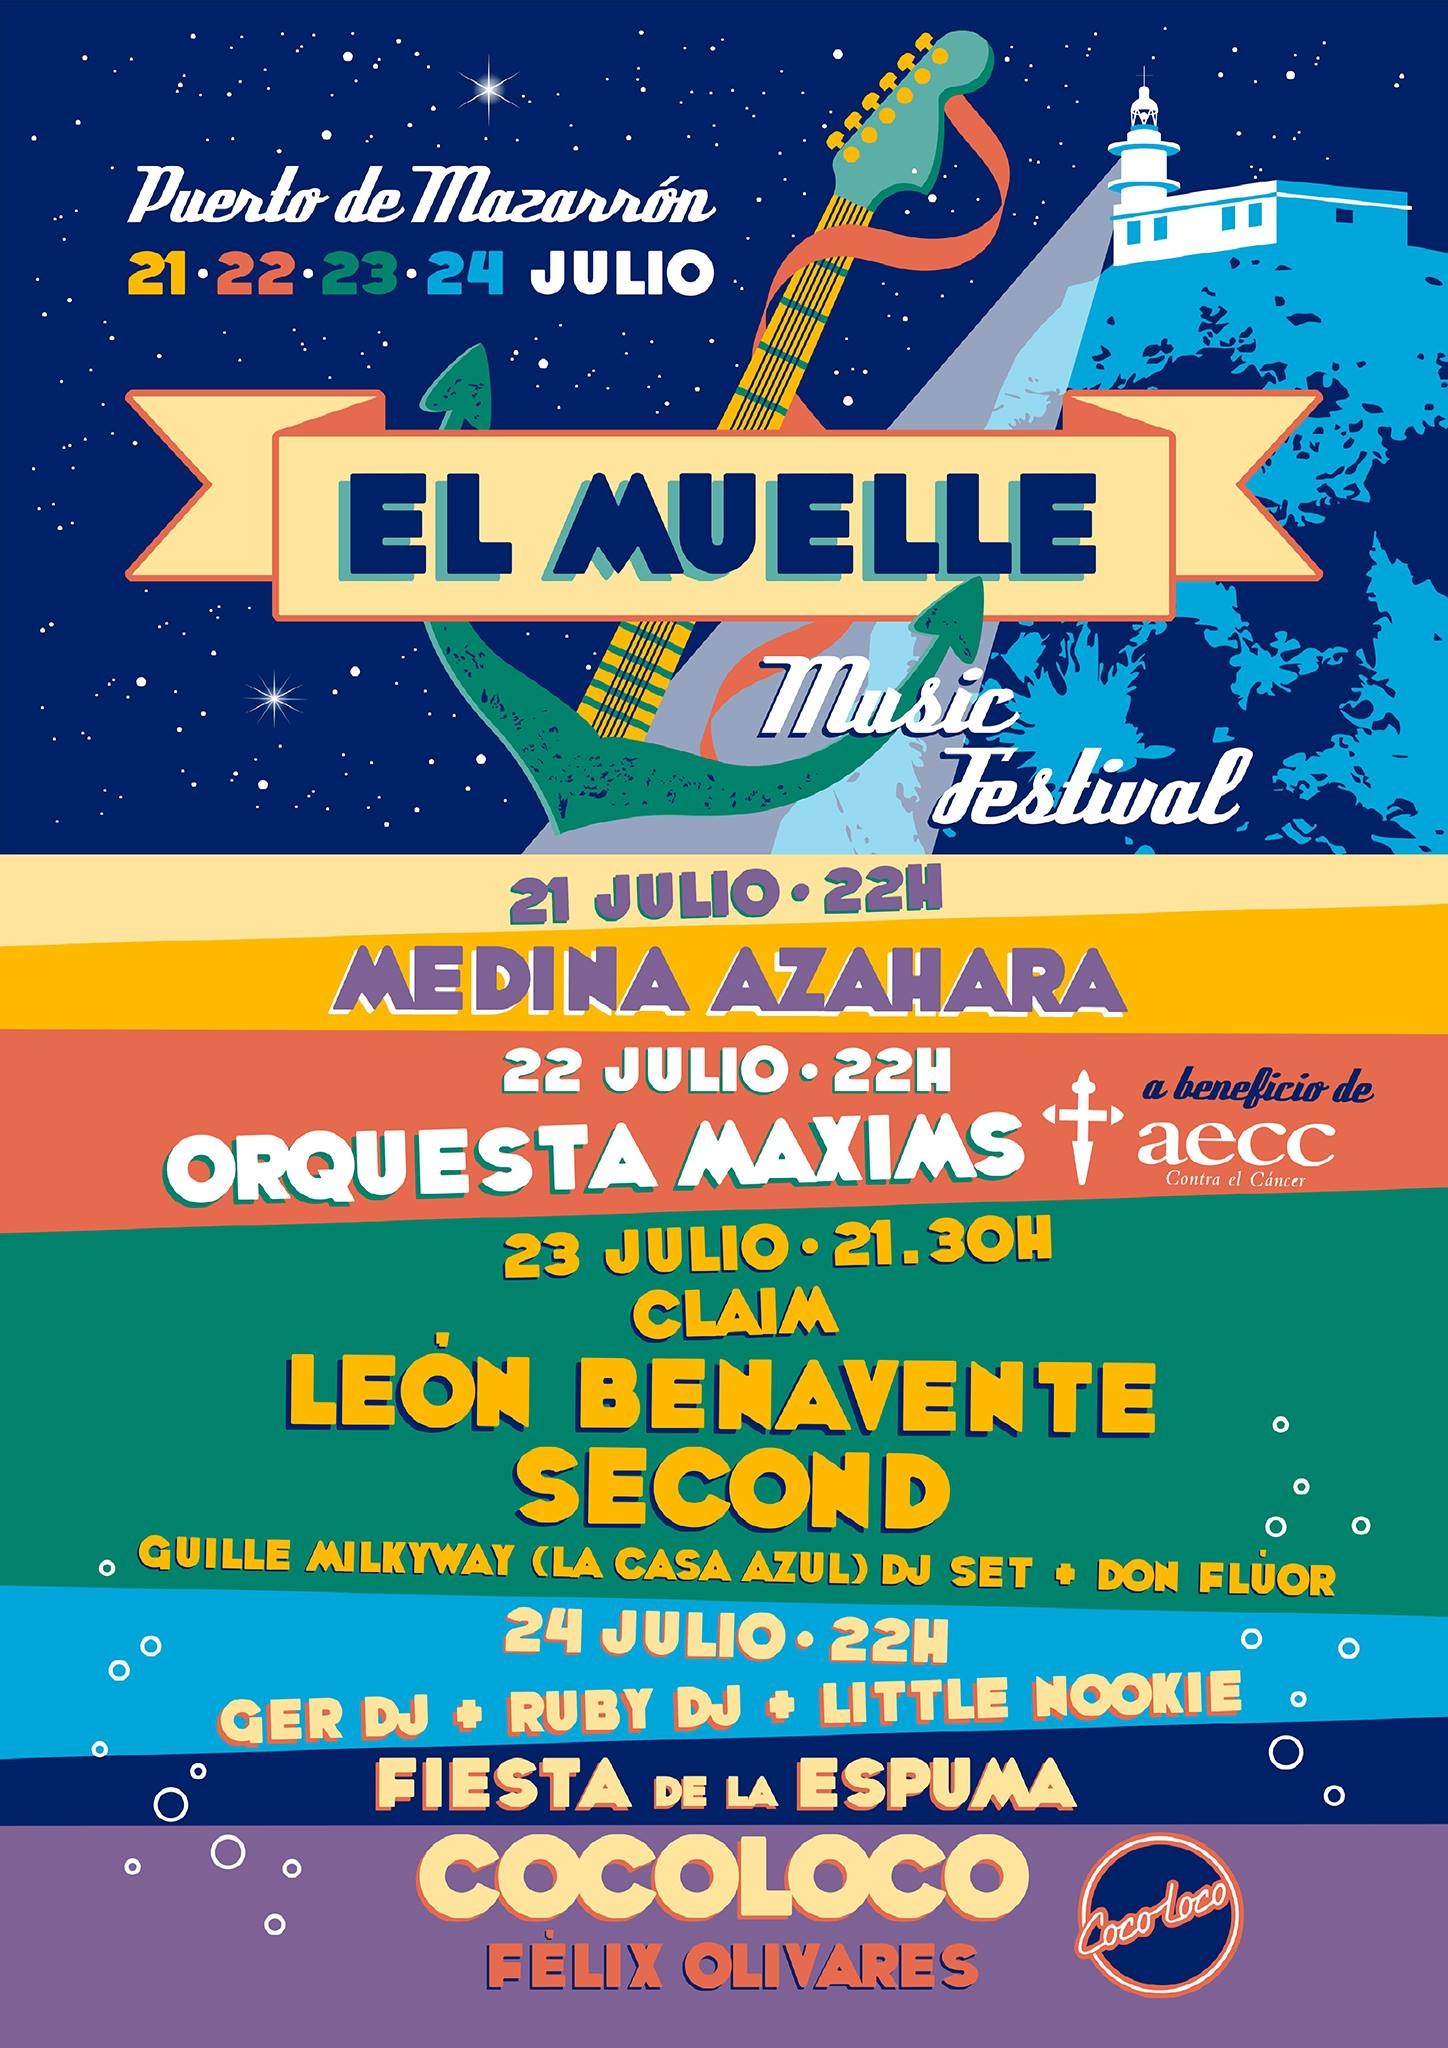 cartel muelle music festival